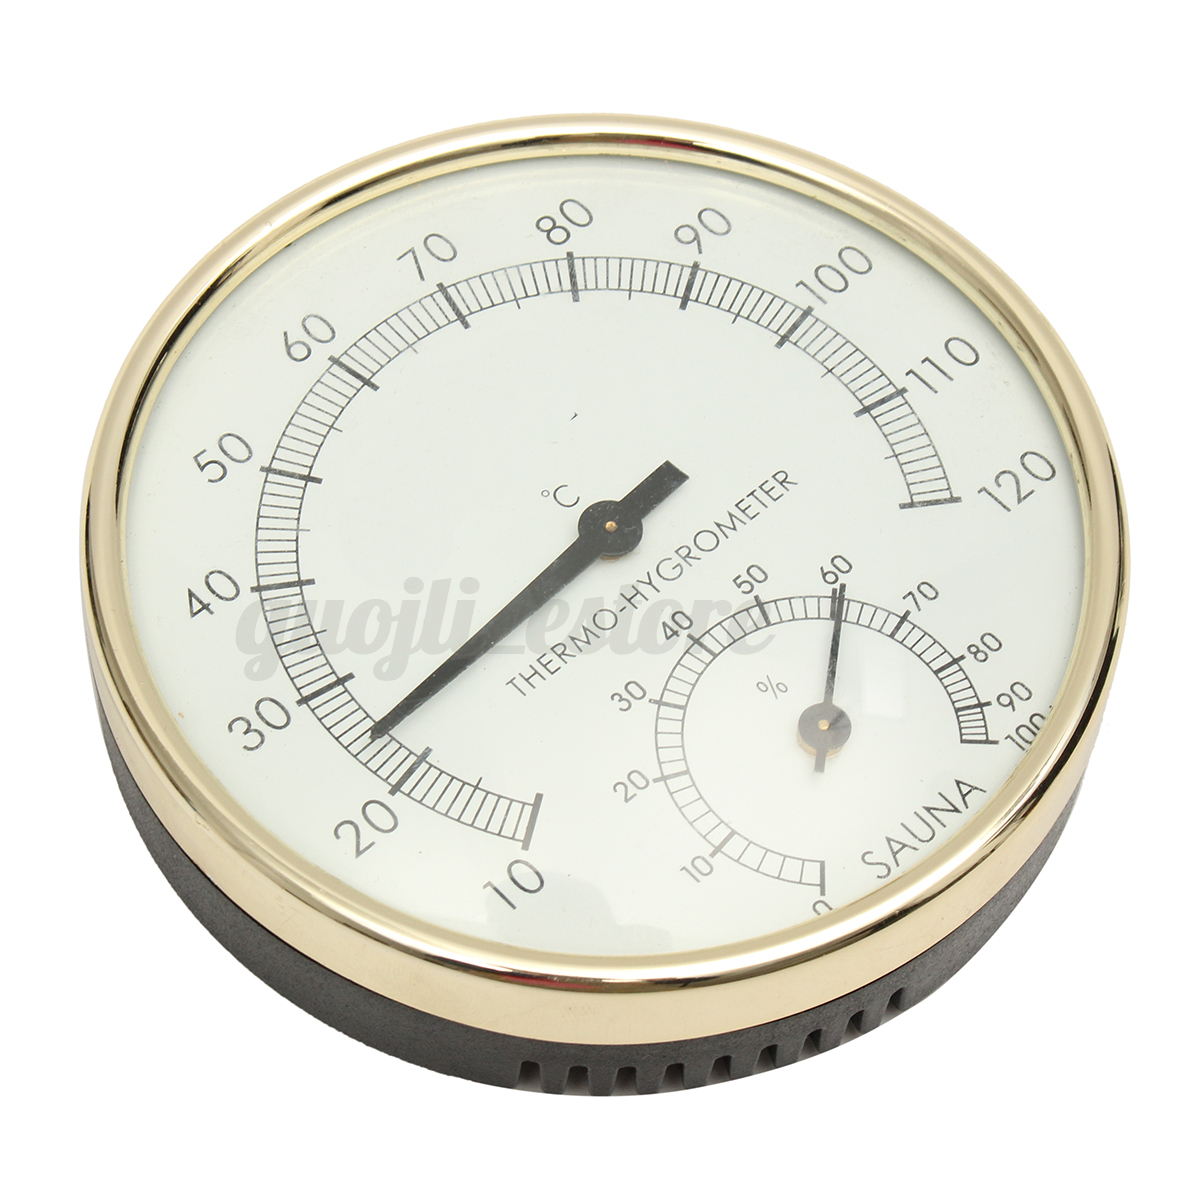 0 c 120 c 100 rh stainless steel gold edge sauna room thermometer hygrometer ebay. Black Bedroom Furniture Sets. Home Design Ideas